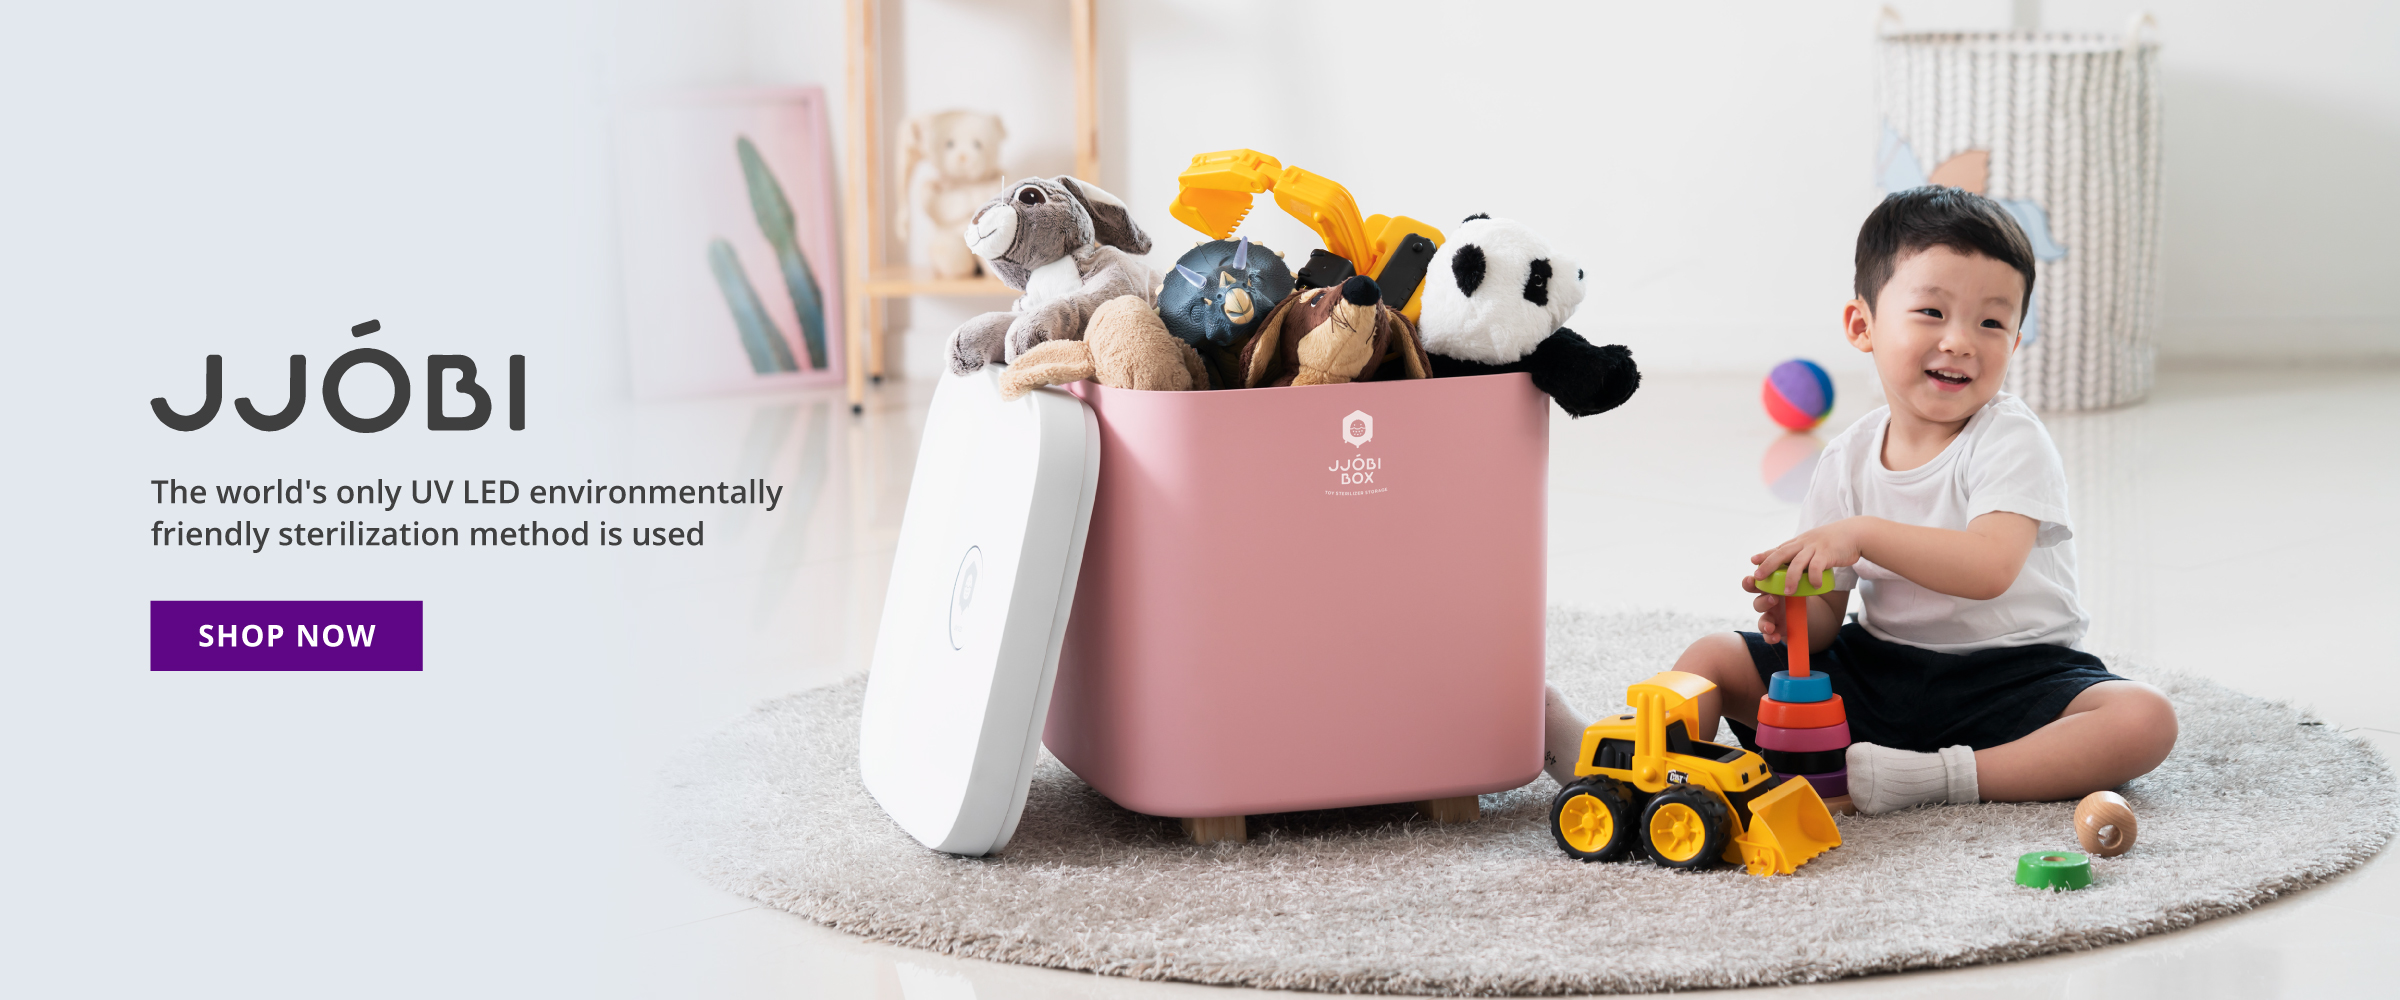 jjobi-box-uv-led-environmentally-friendly-sterilization